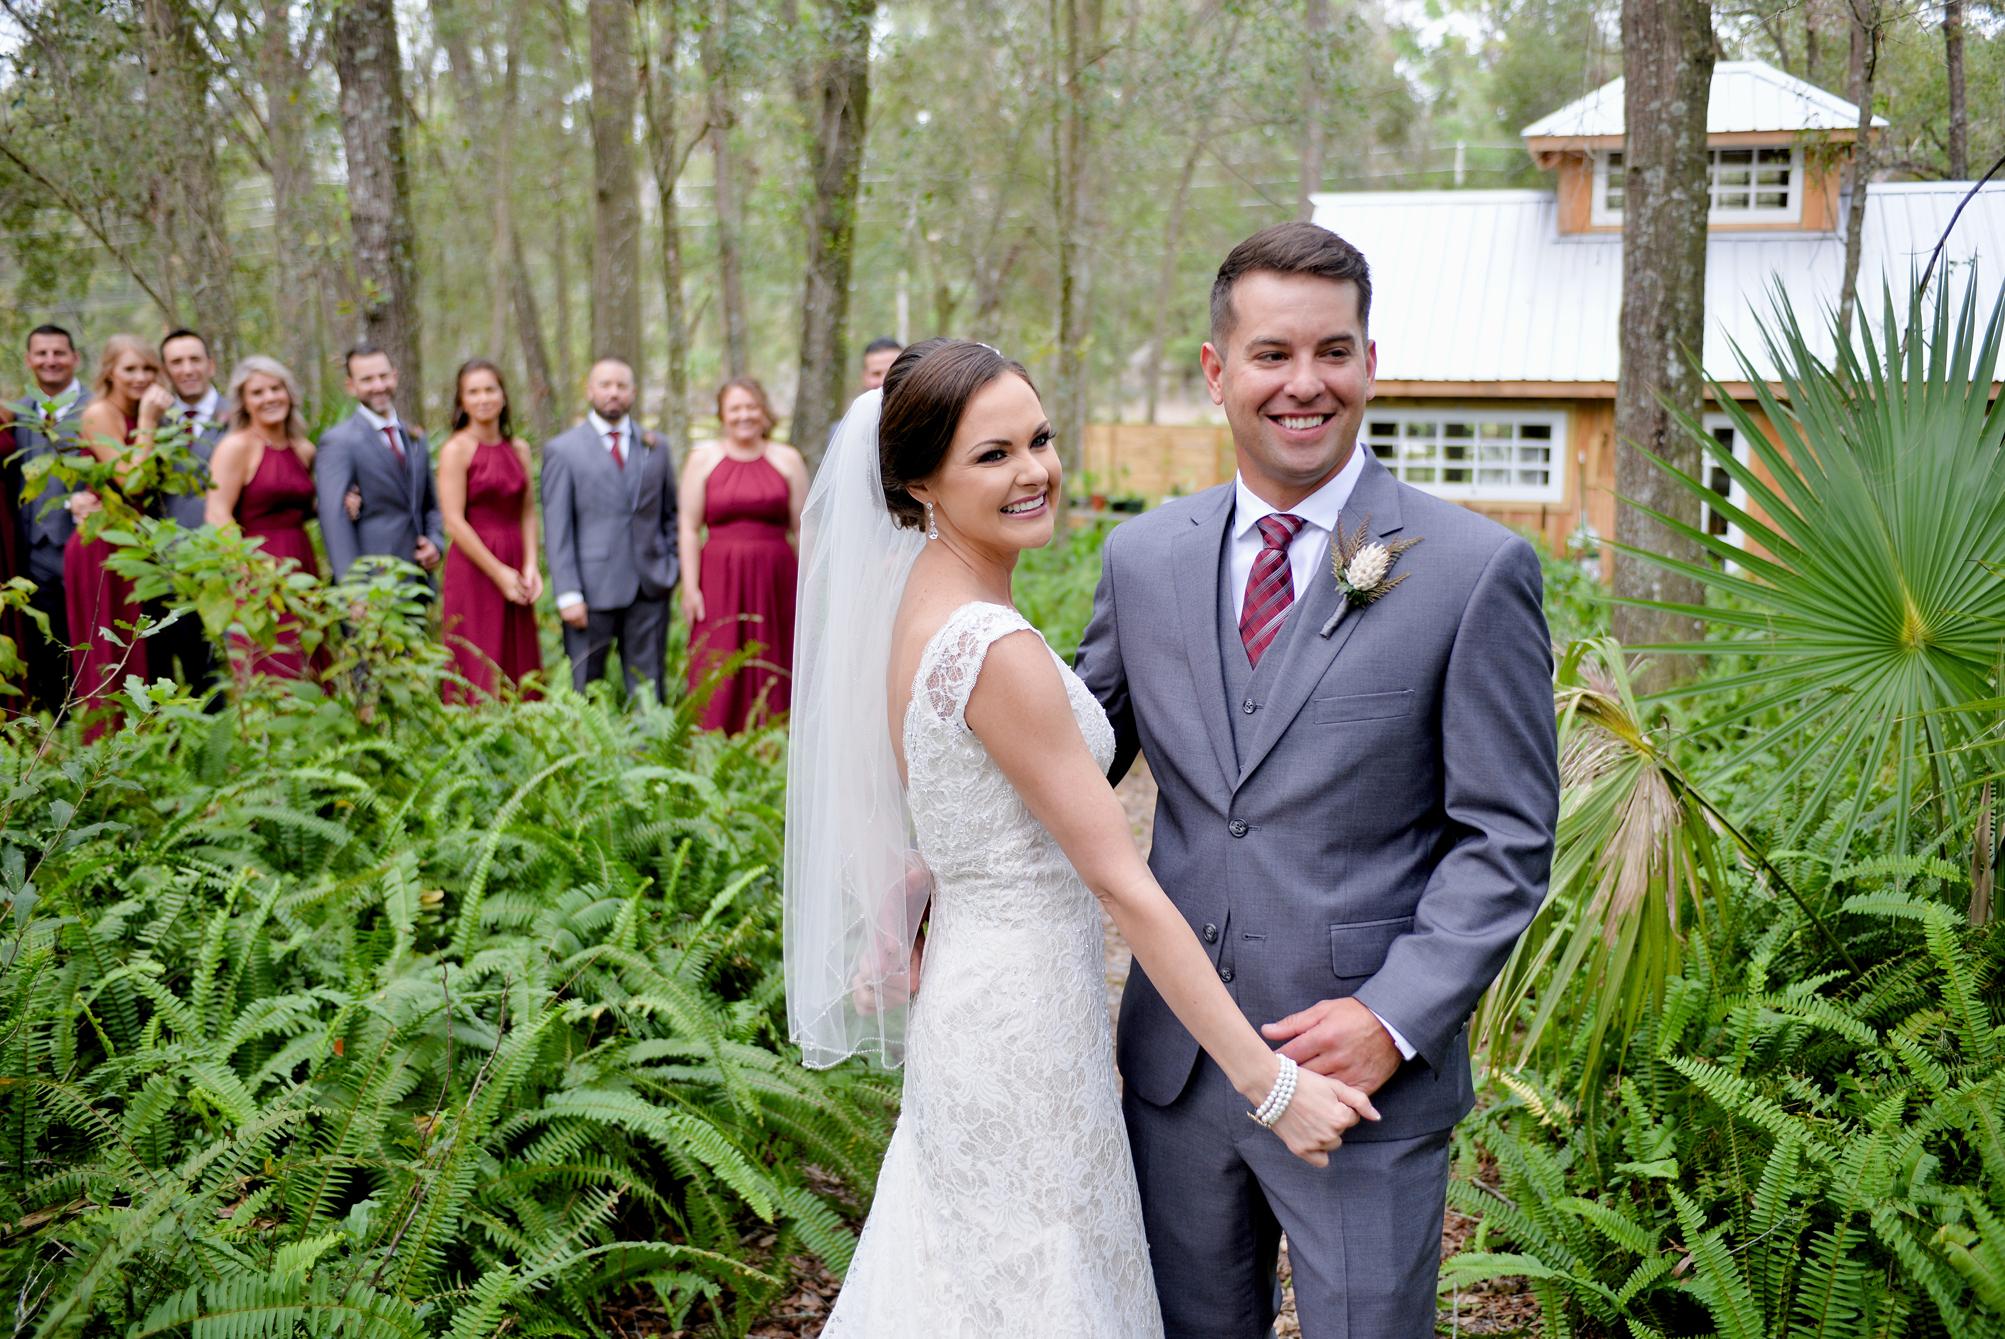 Wedding_JamieMatt_ajneste_0175-retouch.jpg